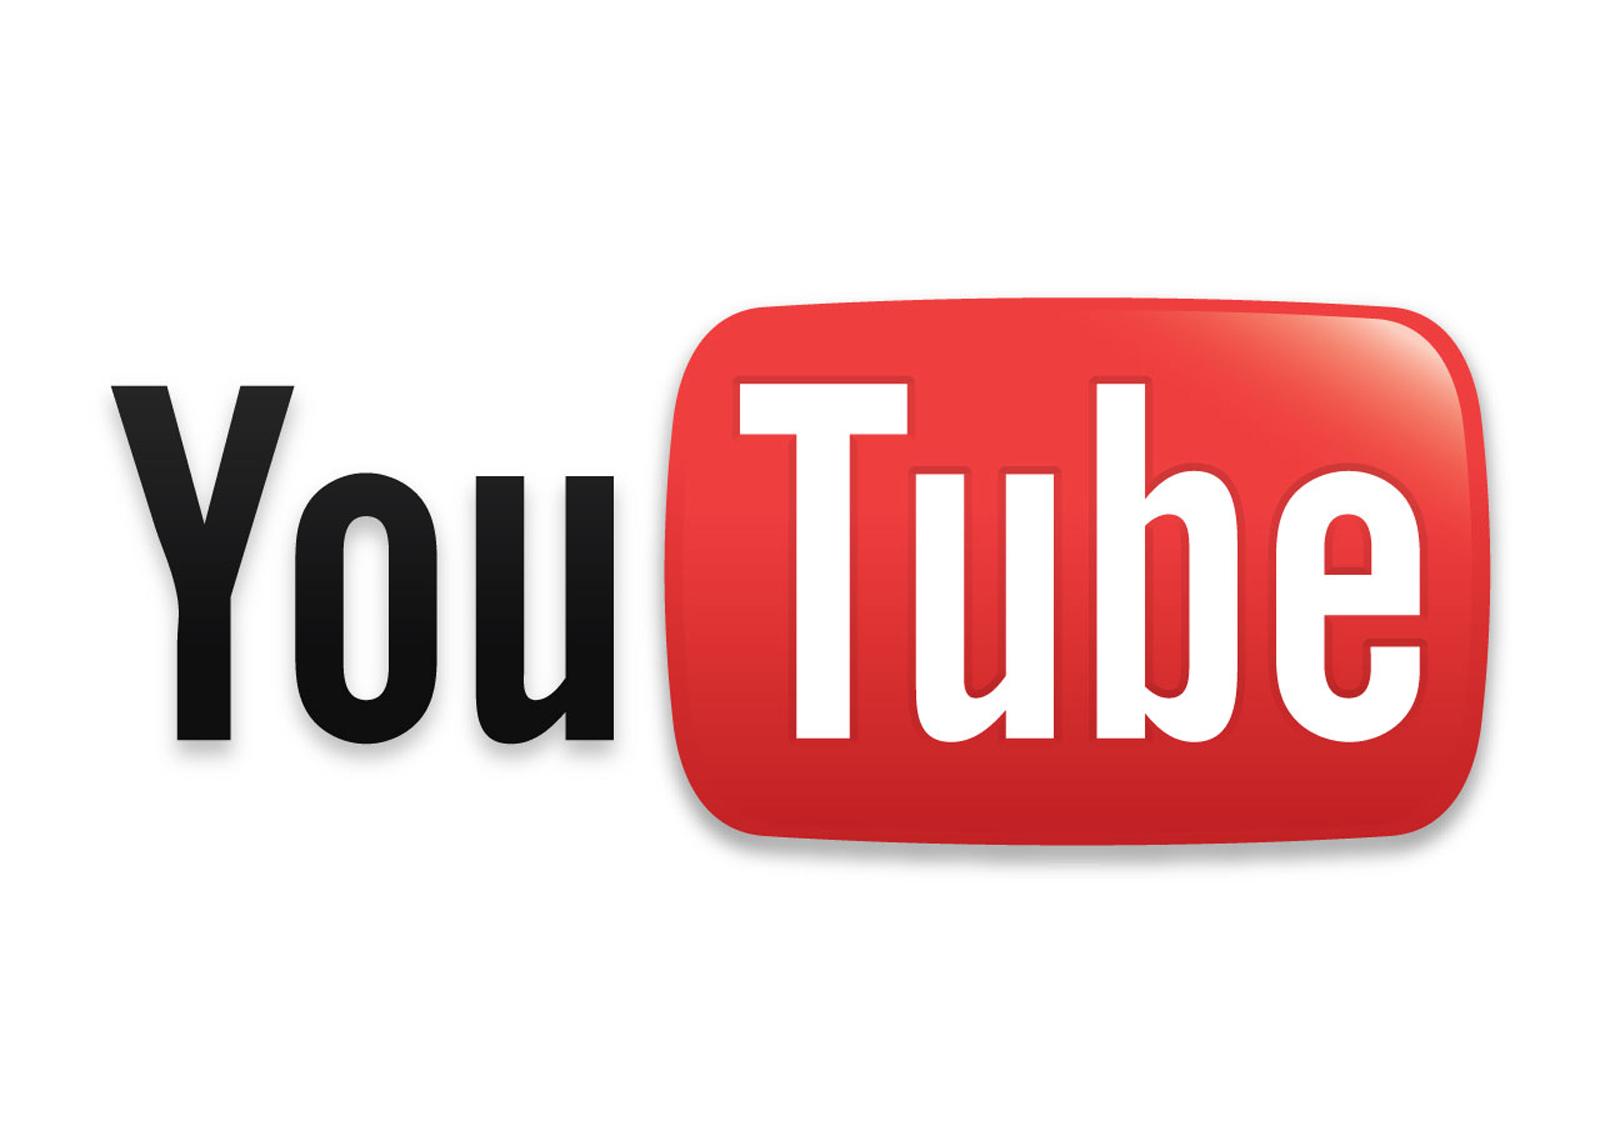 Desktop Wallpapers: Youtube HD Logo & Wallpapers